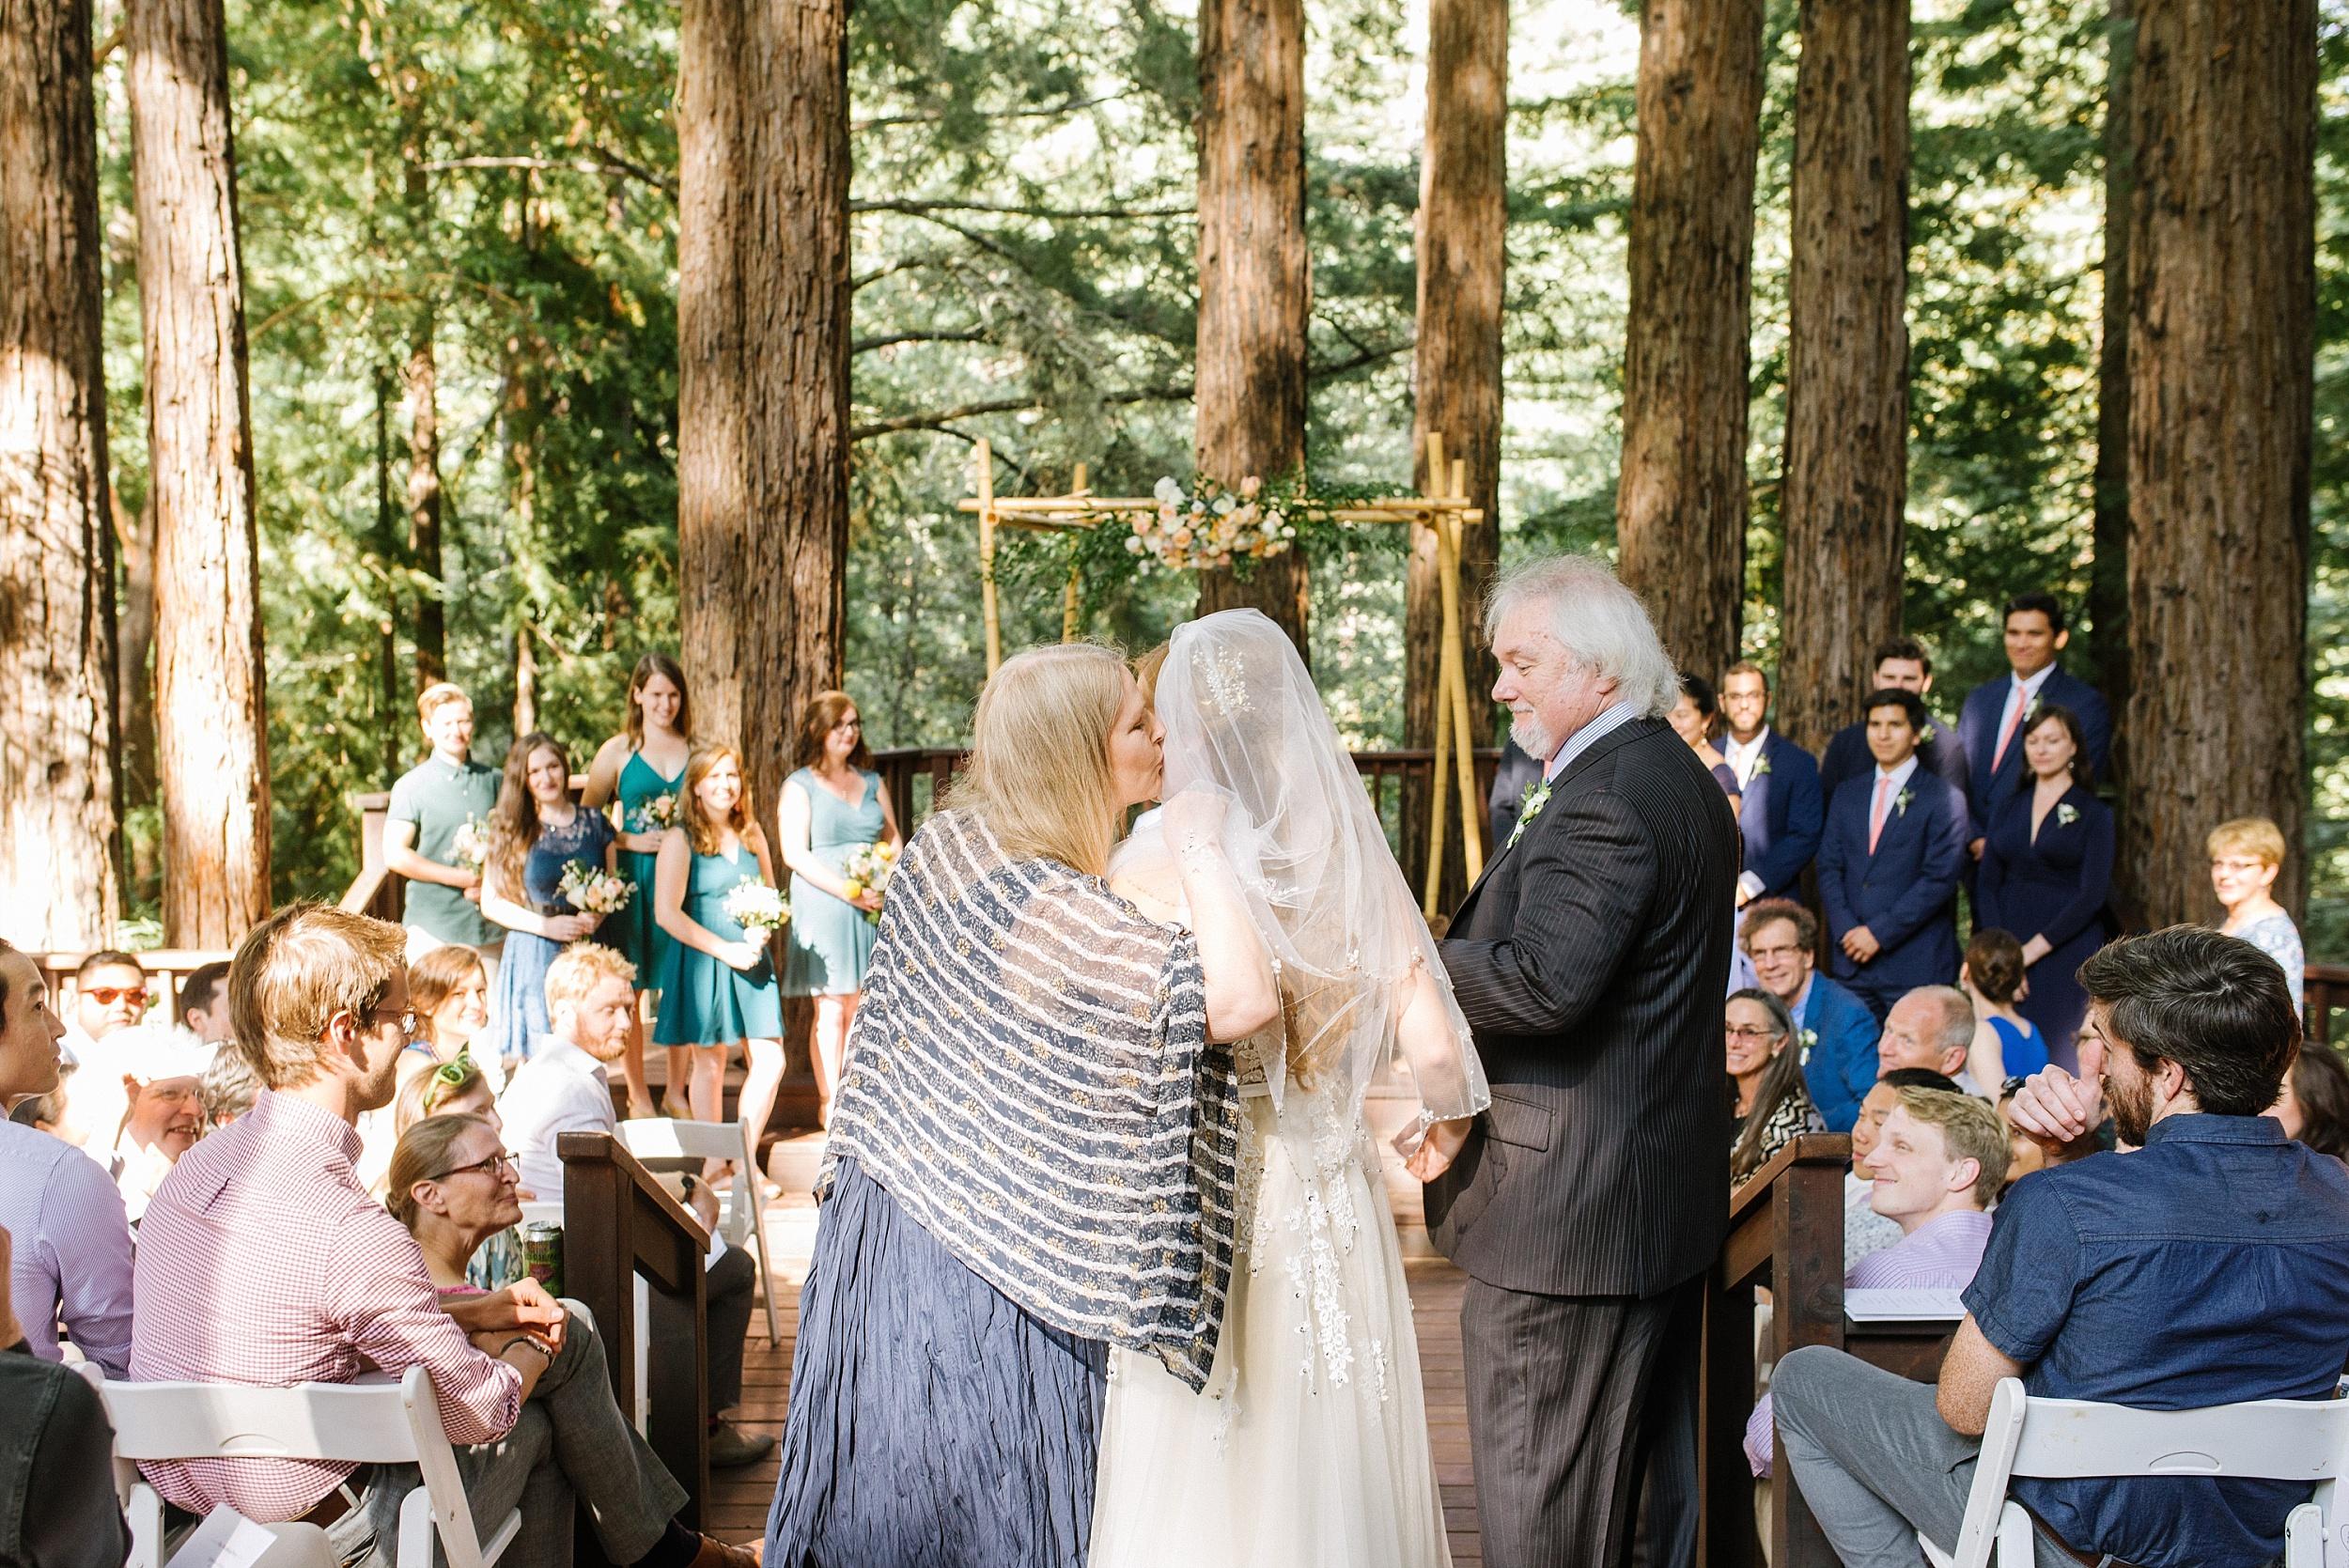 Amphitheatre-of-the-Redwoods-wedding-erikariley_chelsea-dier-photography_0018.jpg